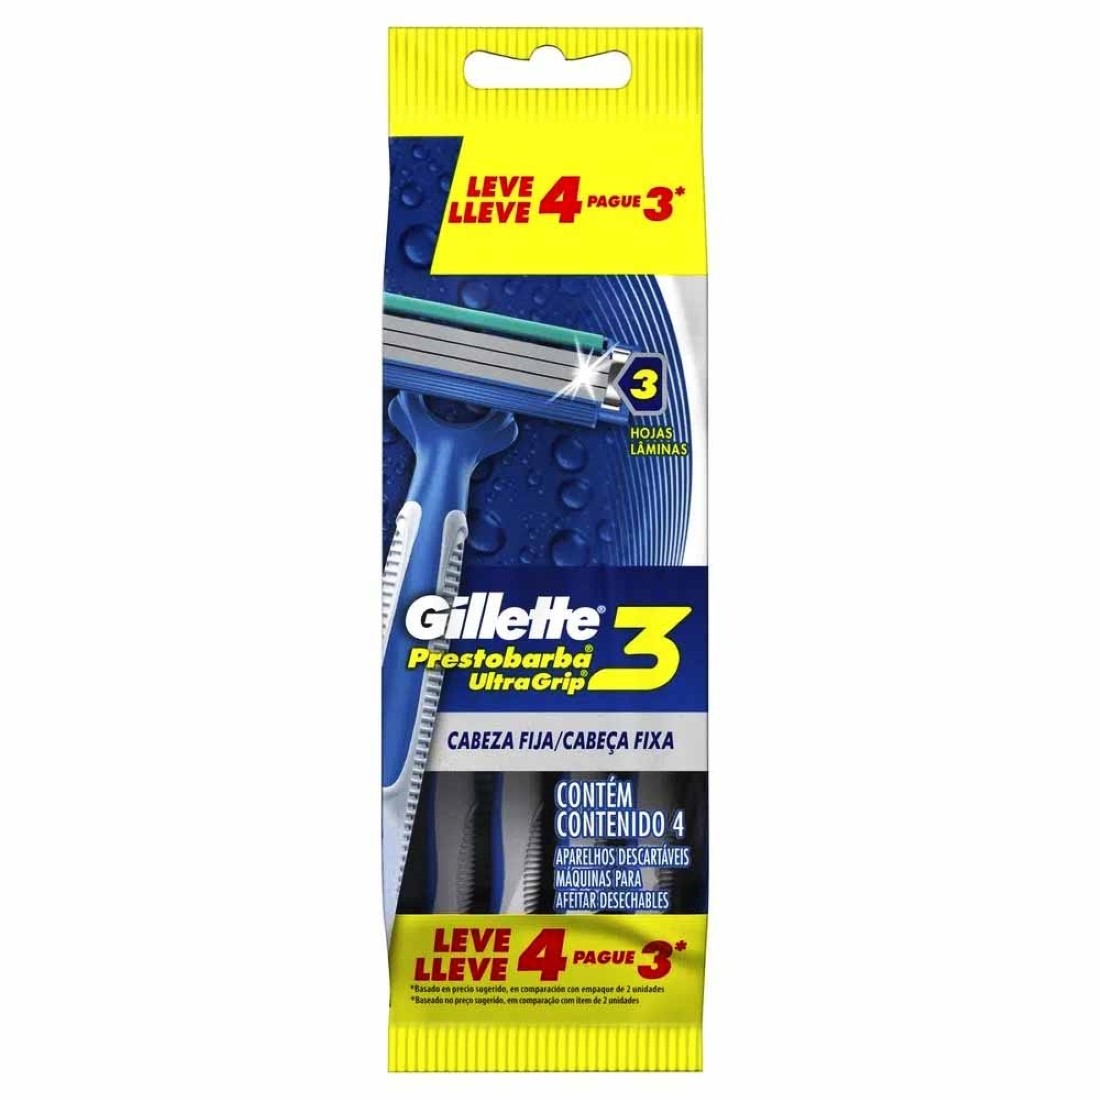 Aparelho Descartável Prestobarba Ultragrip3 contém 4  - Gillette